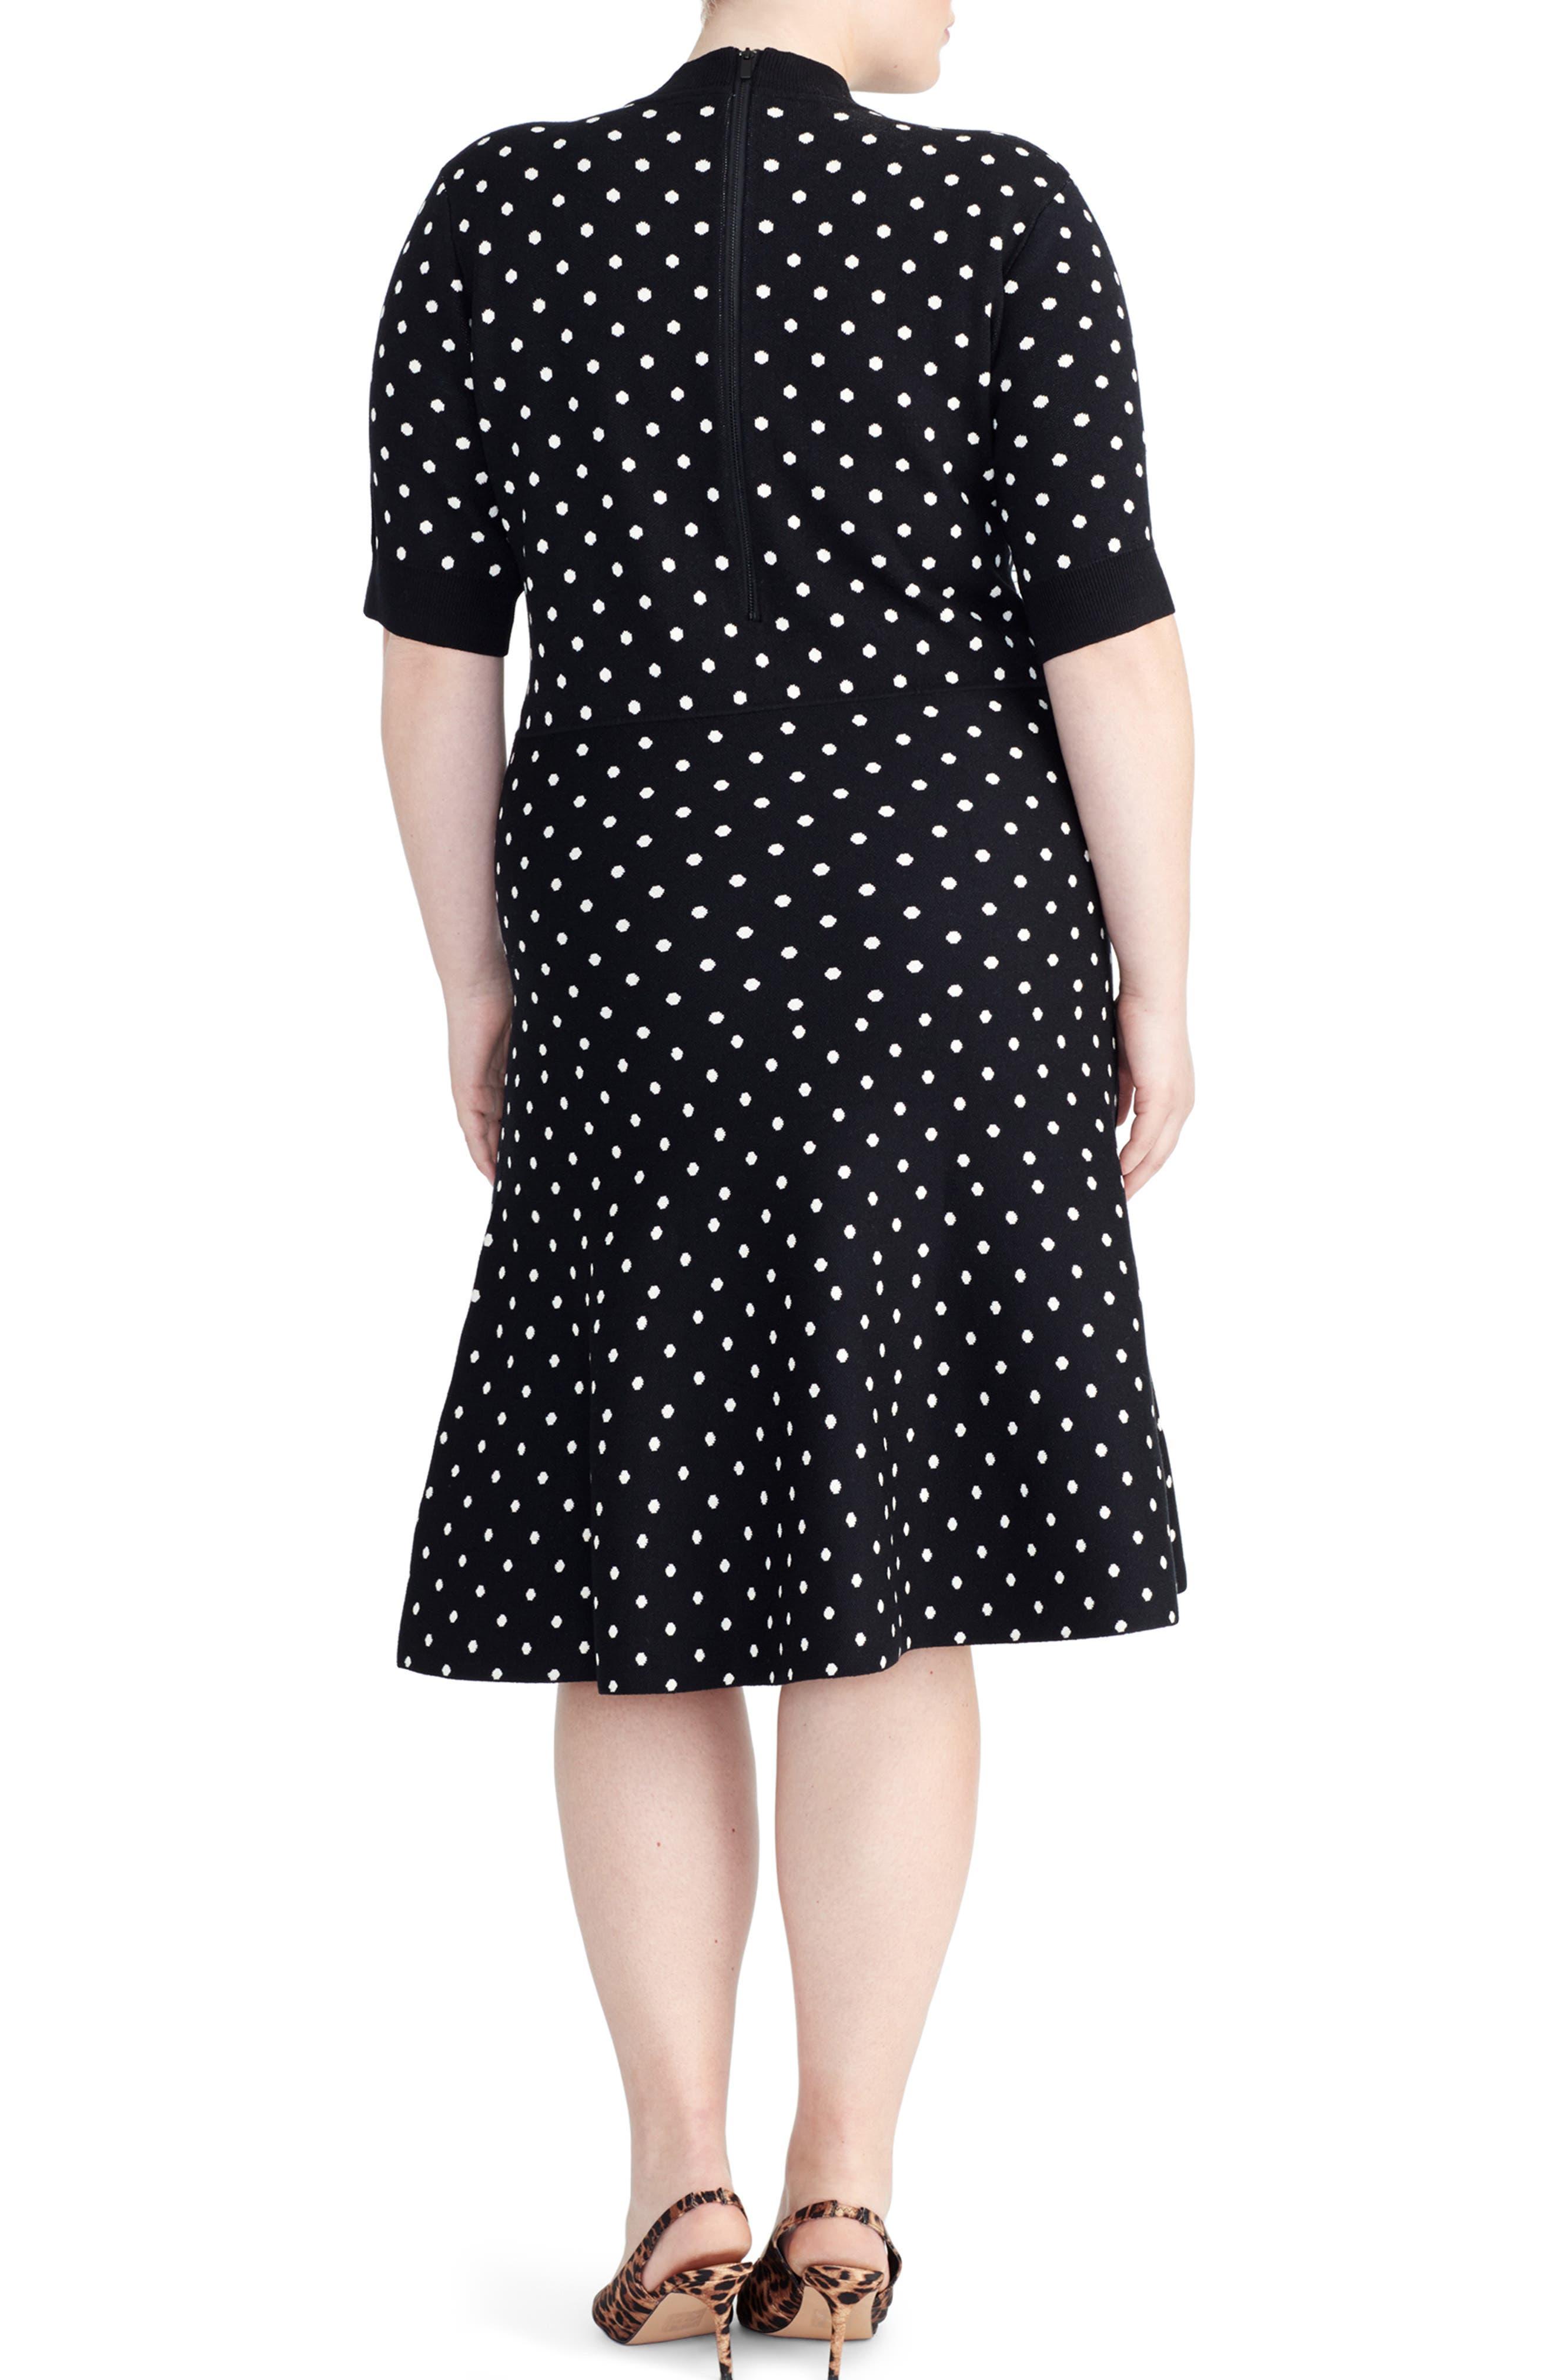 RACHEL ROY COLLECTION,                             Polka Dot Fit & Flare Dress,                             Alternate thumbnail 2, color,                             BLACK/ LIGHT BIEGE